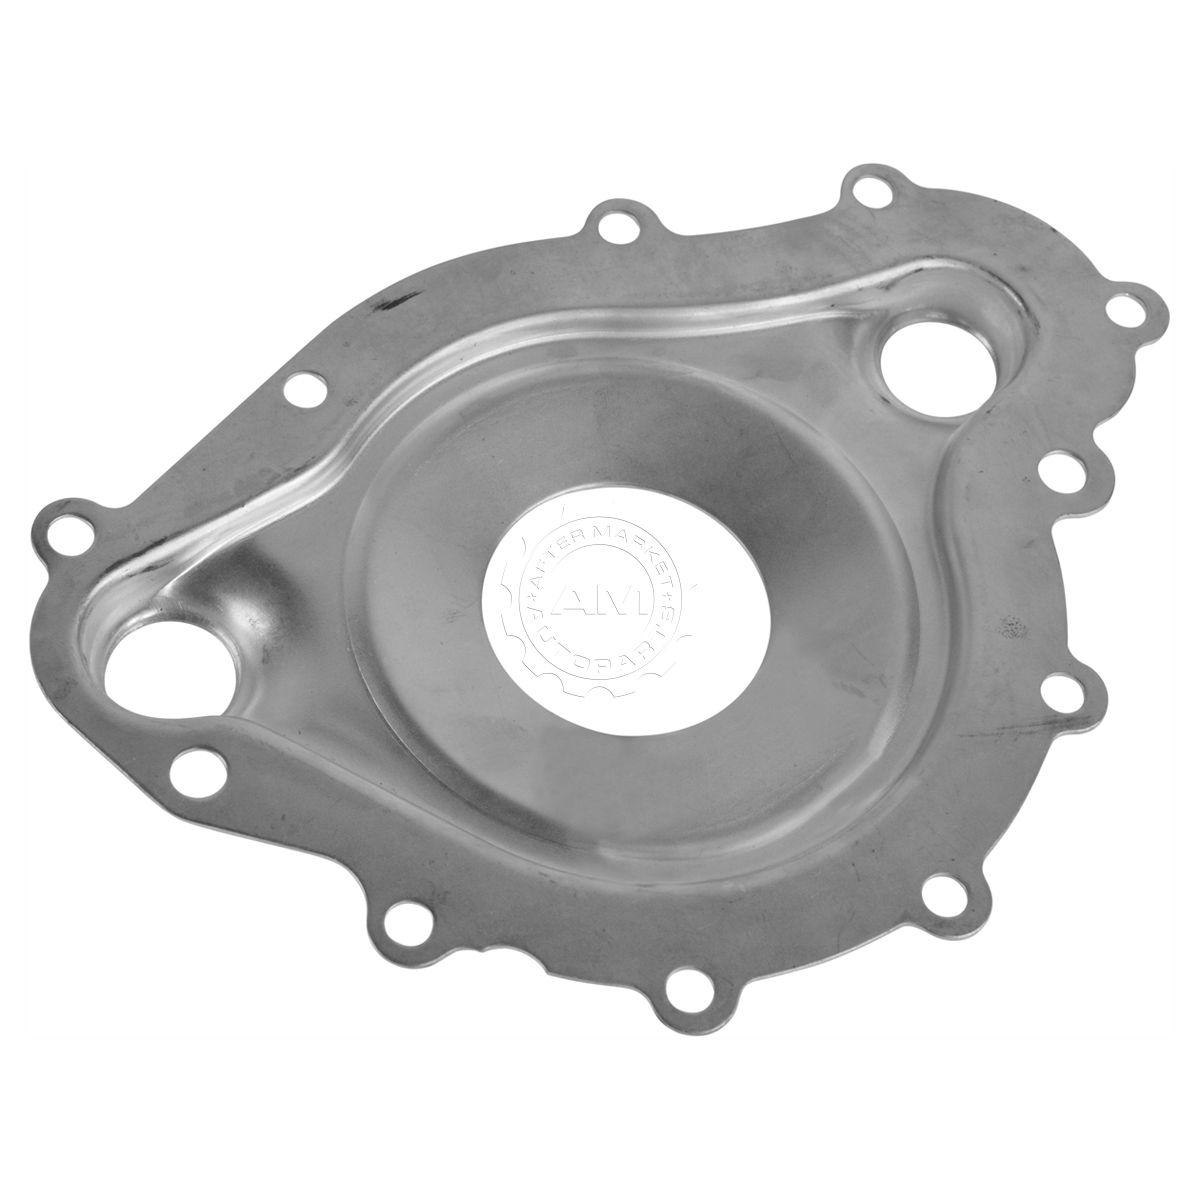 Buick Wildcat V8 Engine: OEM 9796349 Water Pump Housing Divider Plate For Pontiac